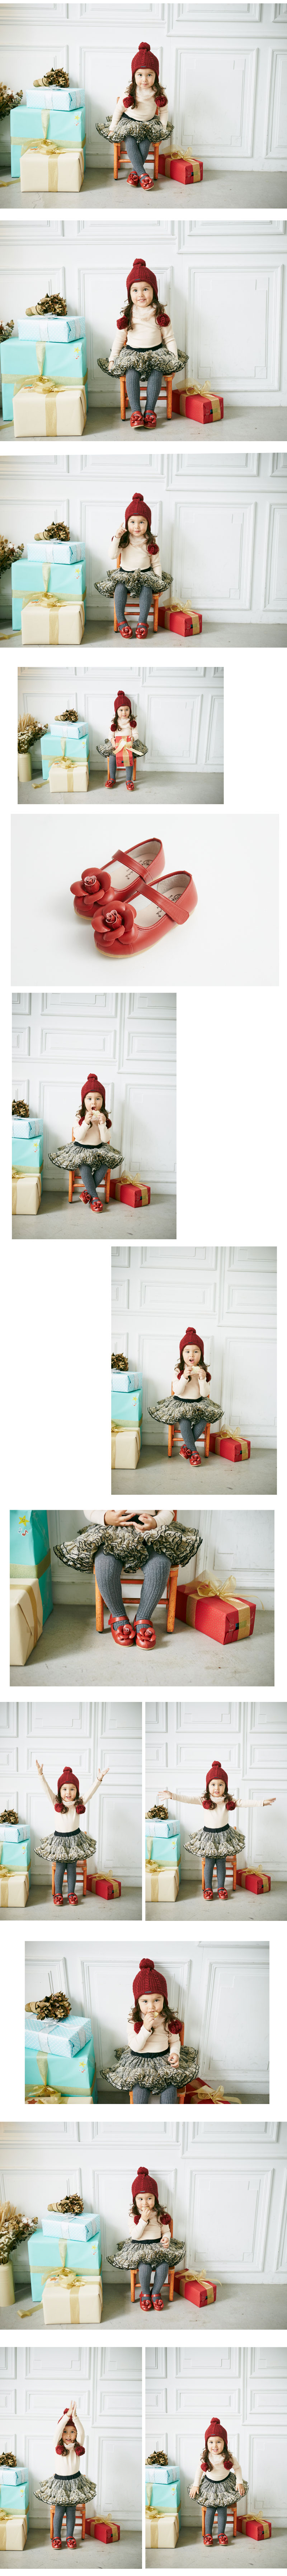 http://shop.r10s.com/5e7ca0c0-ec8c-11e4-ac44-005056b756e3/2015-12-kid/7161-2.jpg